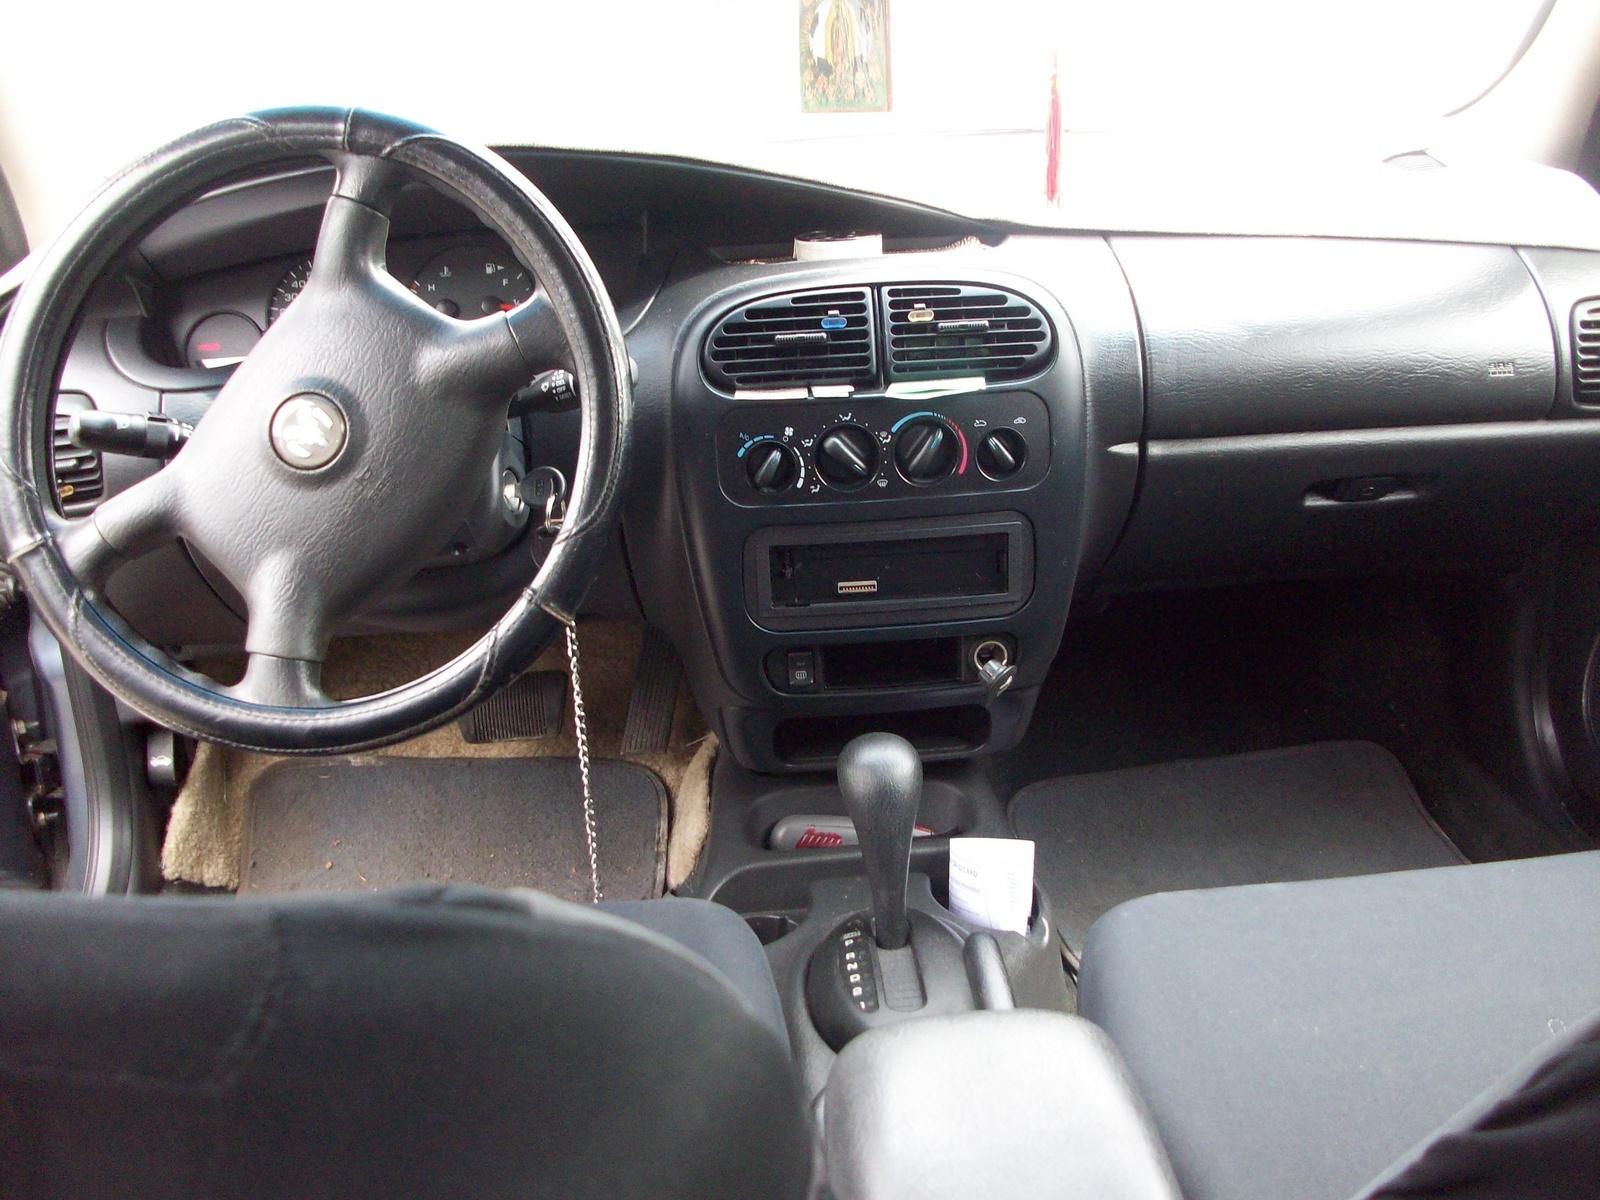 Dodge Neon Base Pic on 2004 Dodge Ram 3500 Specs